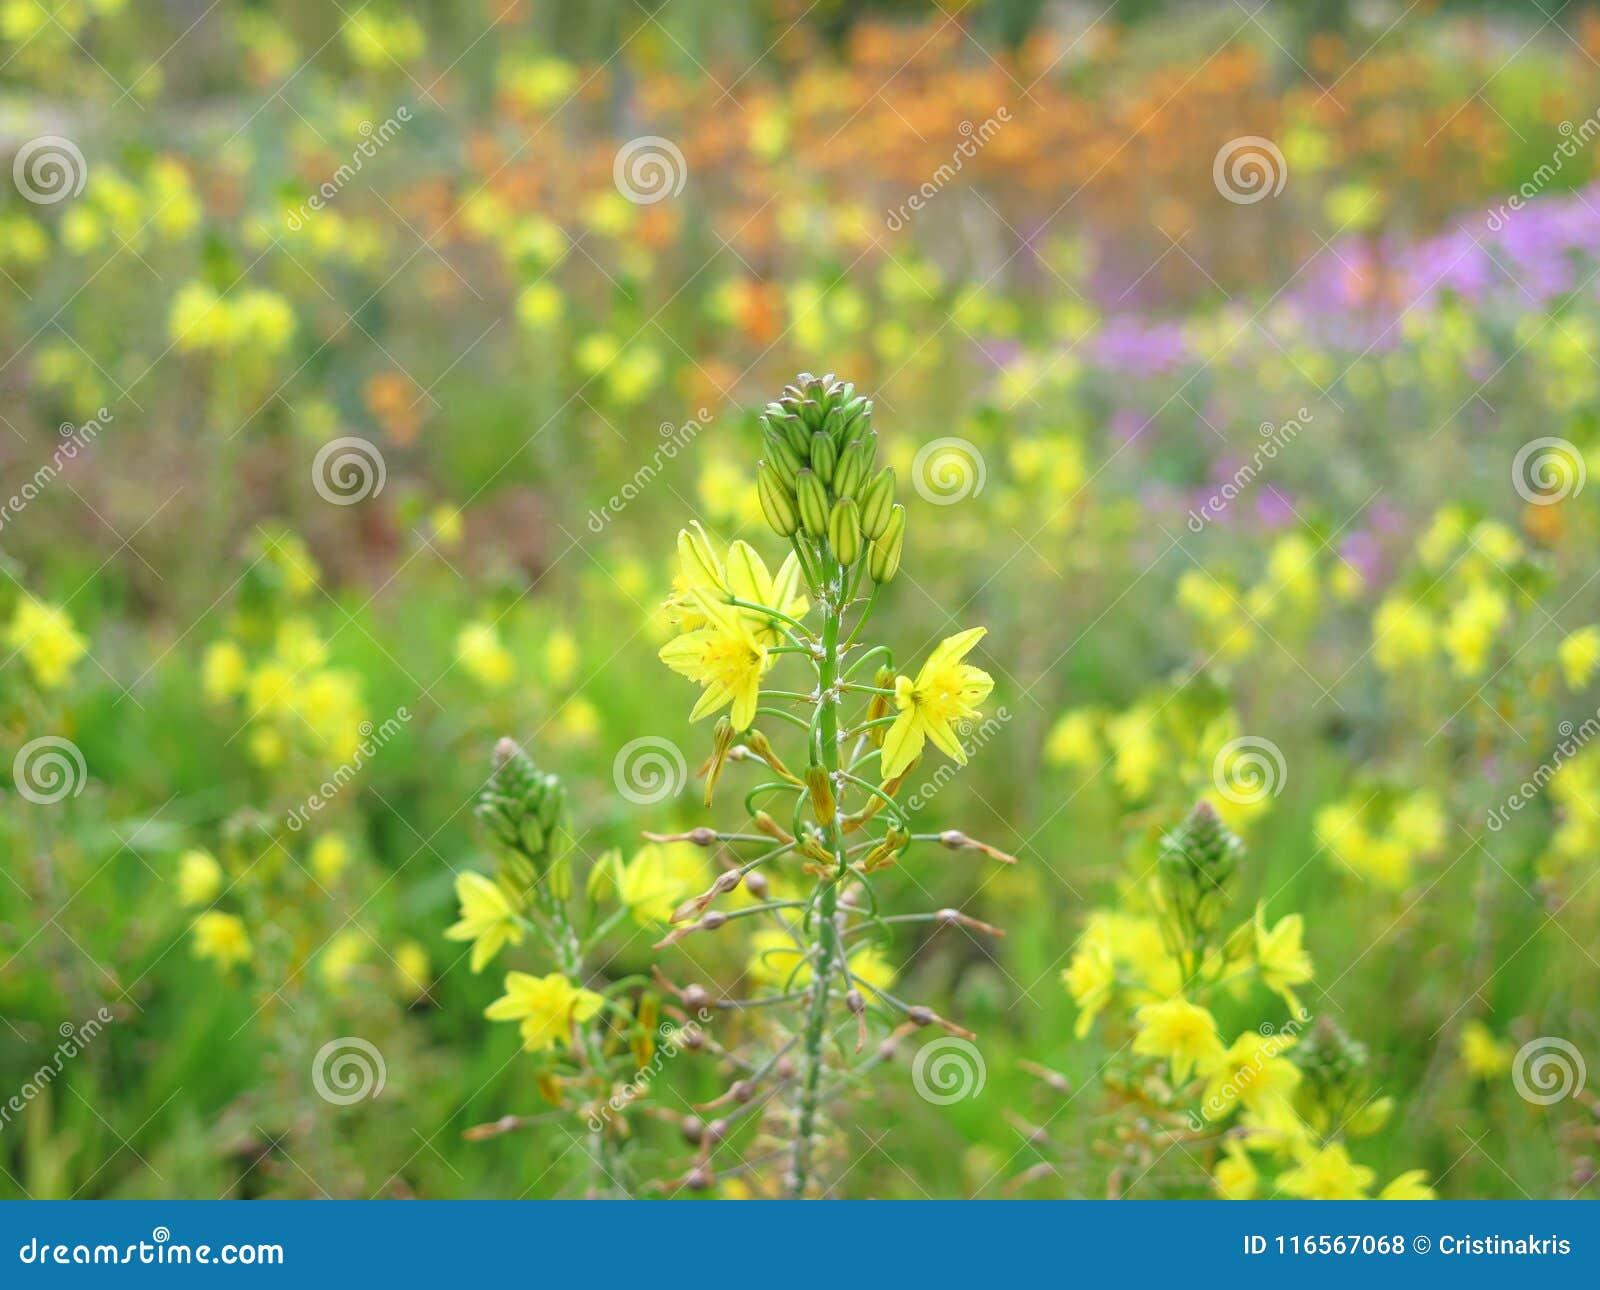 Exotic Yellow Flowers Stock Photo Image Of Gardening 116567068